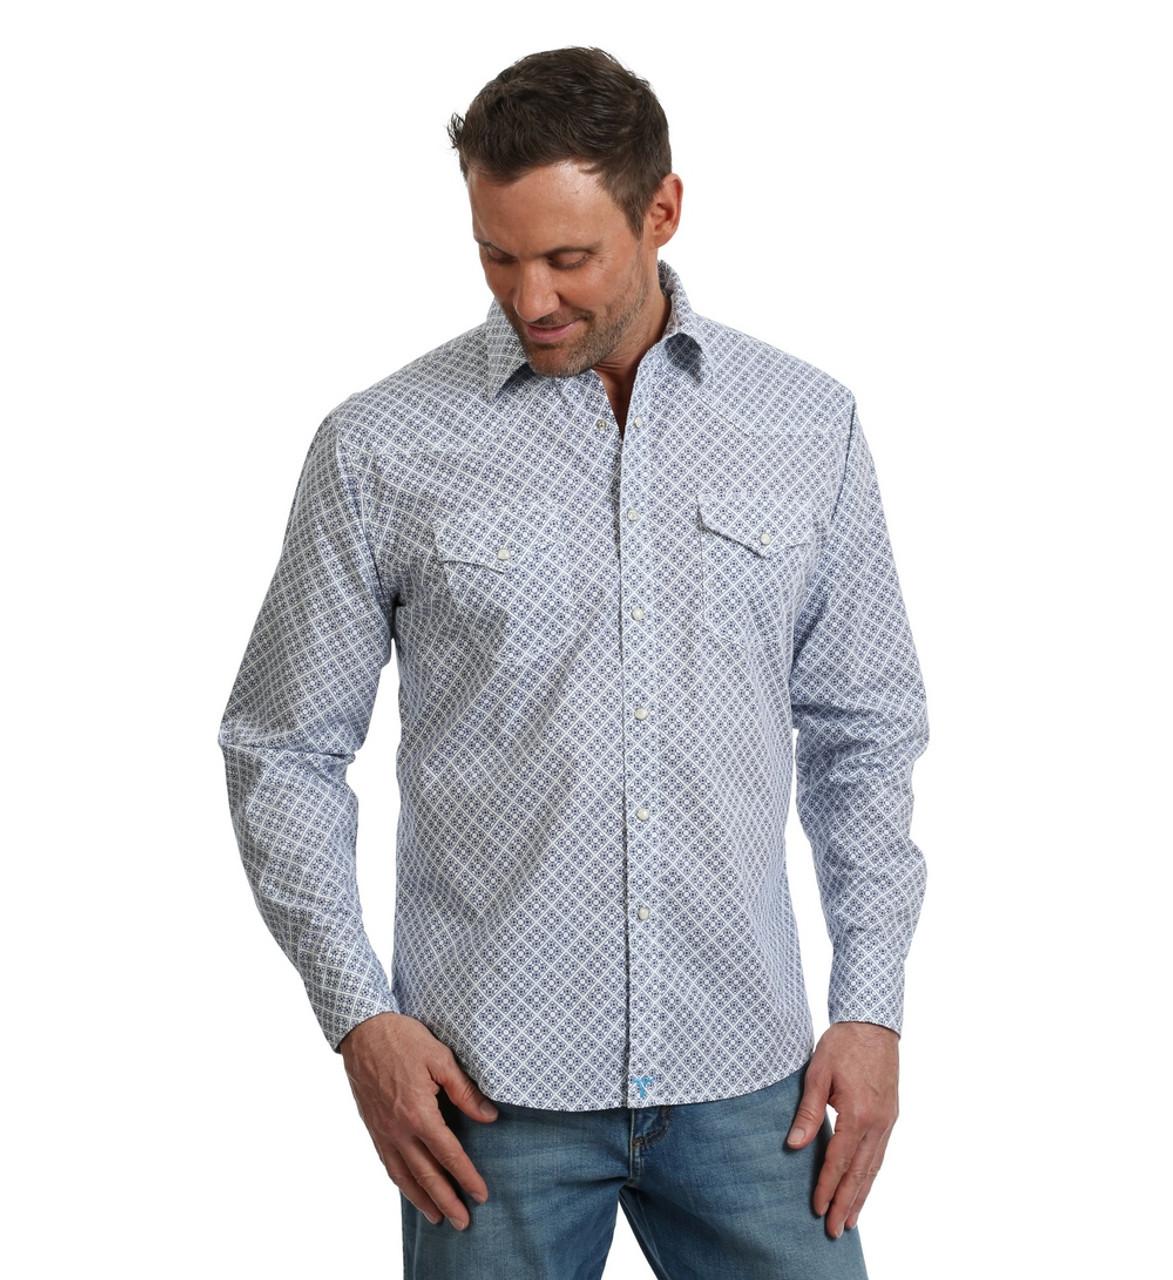 e36c8a17 Wrangler 20X Adv Comfort Print Shirt- Western Wear